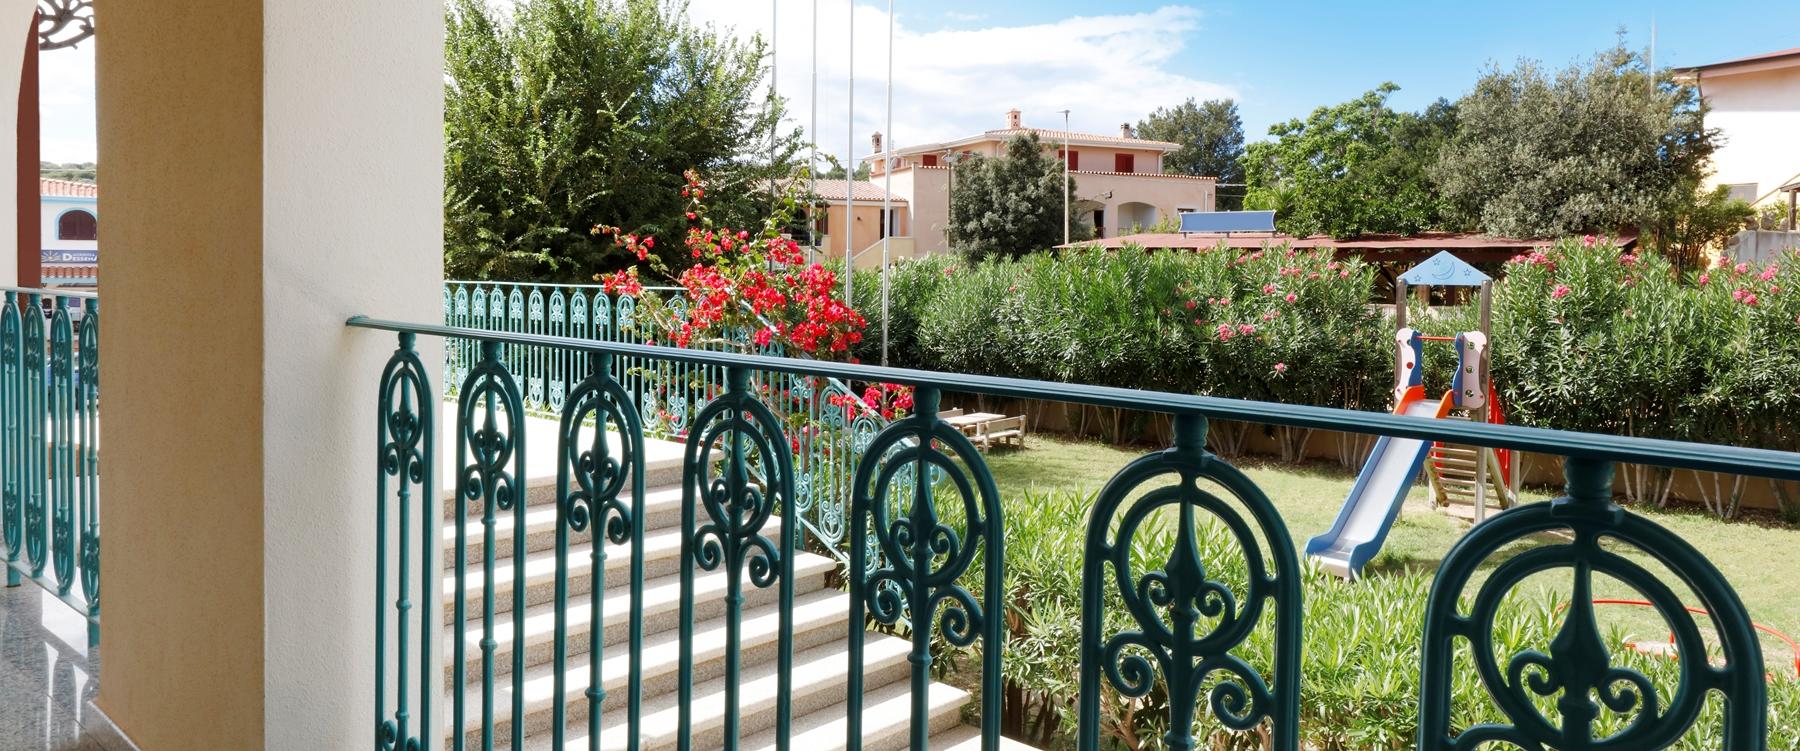 Photo Gallery Hotel  Sardegna - Italia